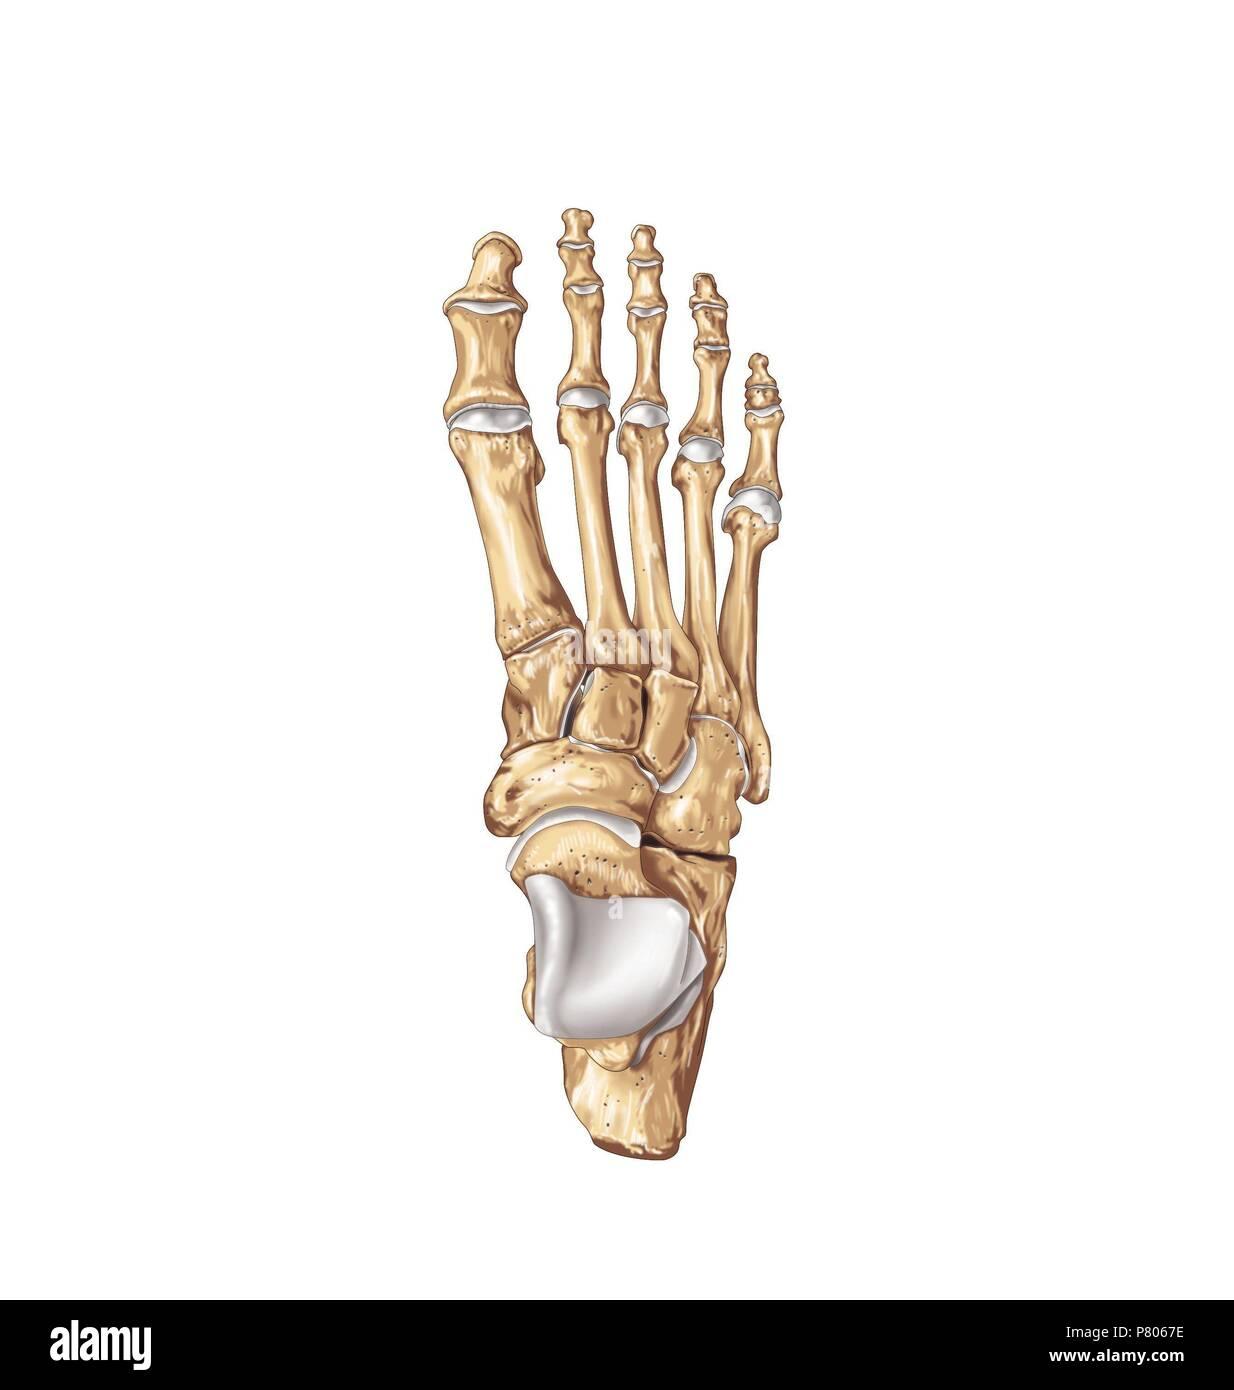 Fuß Knochen Stockfoto, Bild: 211446578 - Alamy